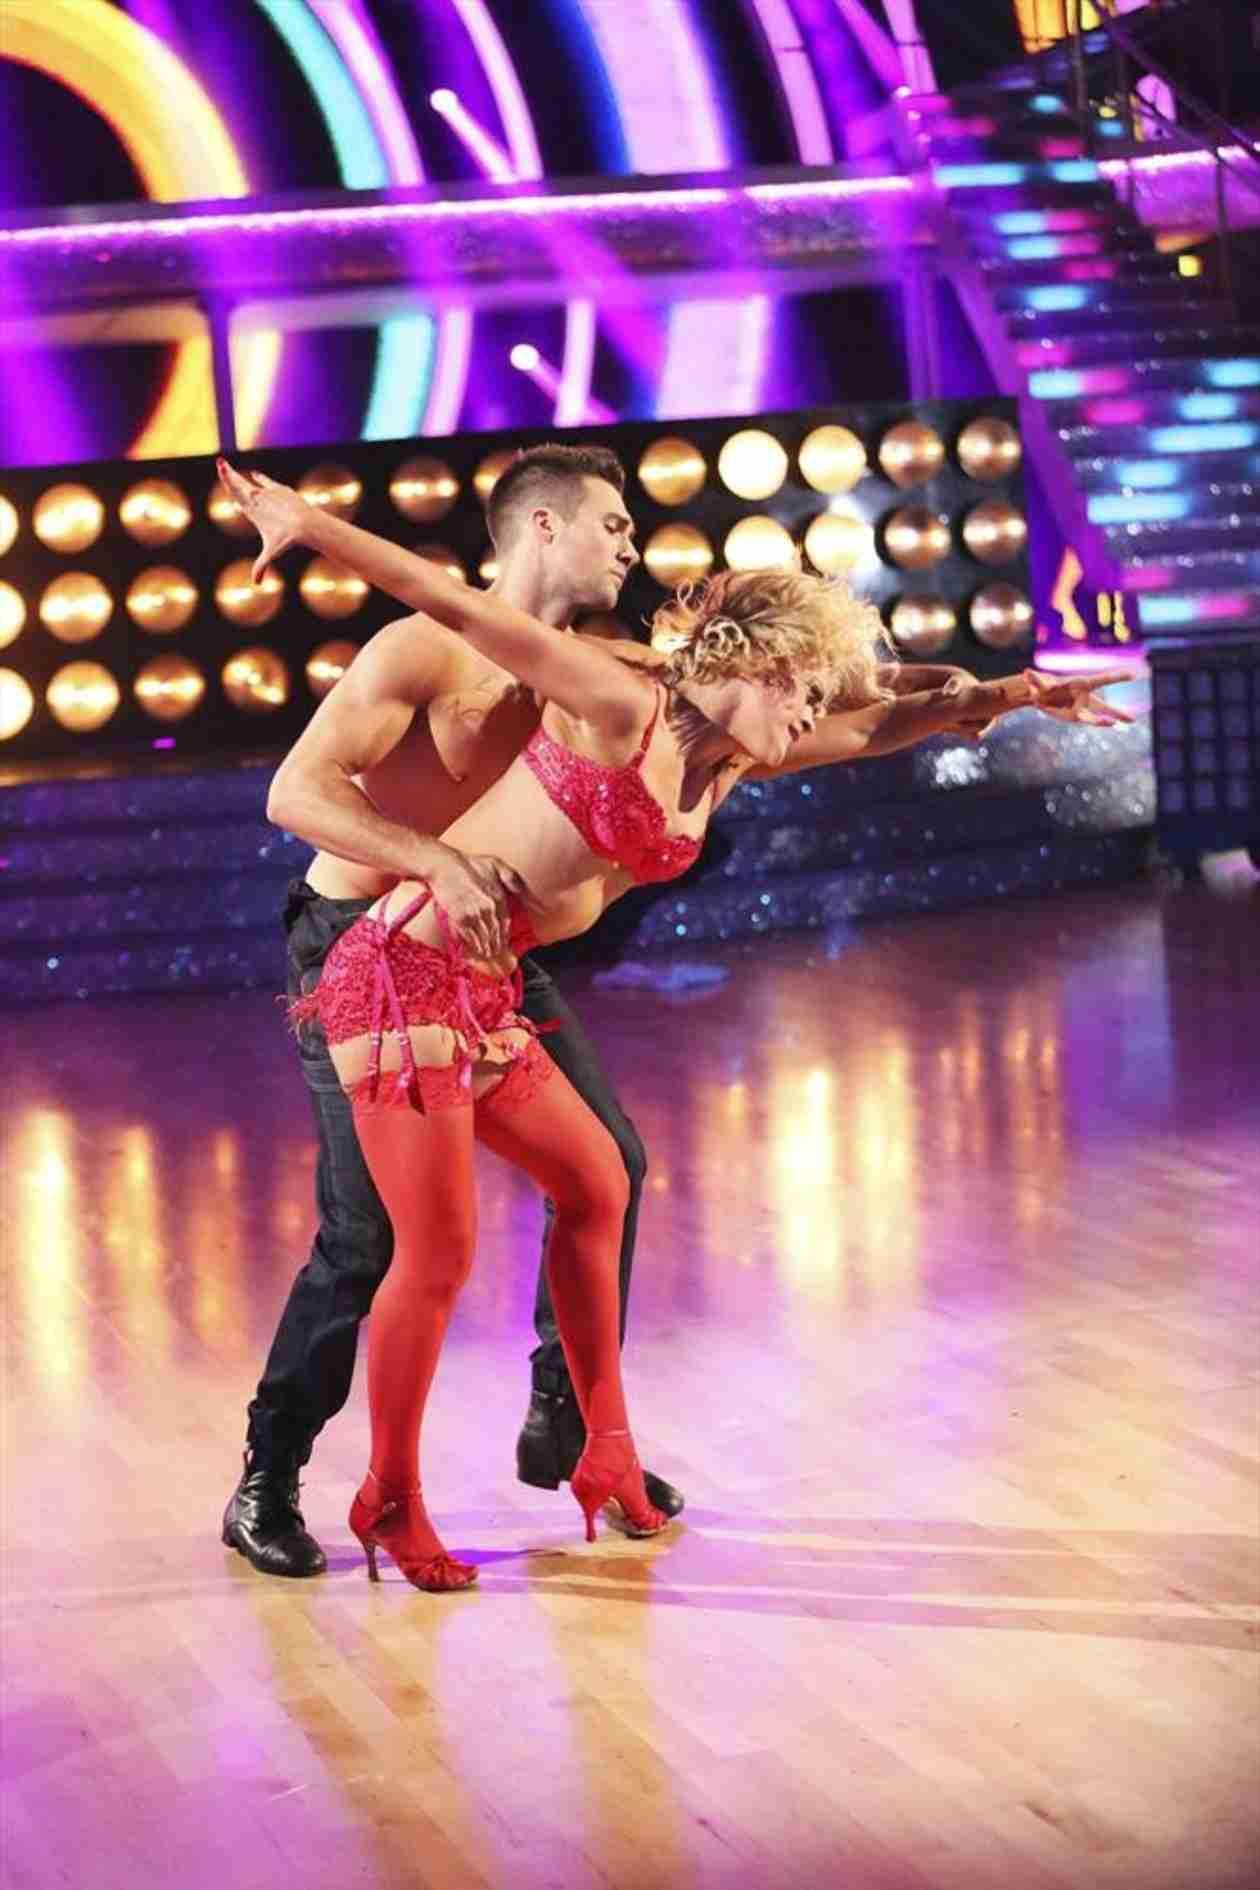 Dancing With the Stars 2014: James Maslow and Peta Murgatroyd's Week 9 Rumba (VIDEO)